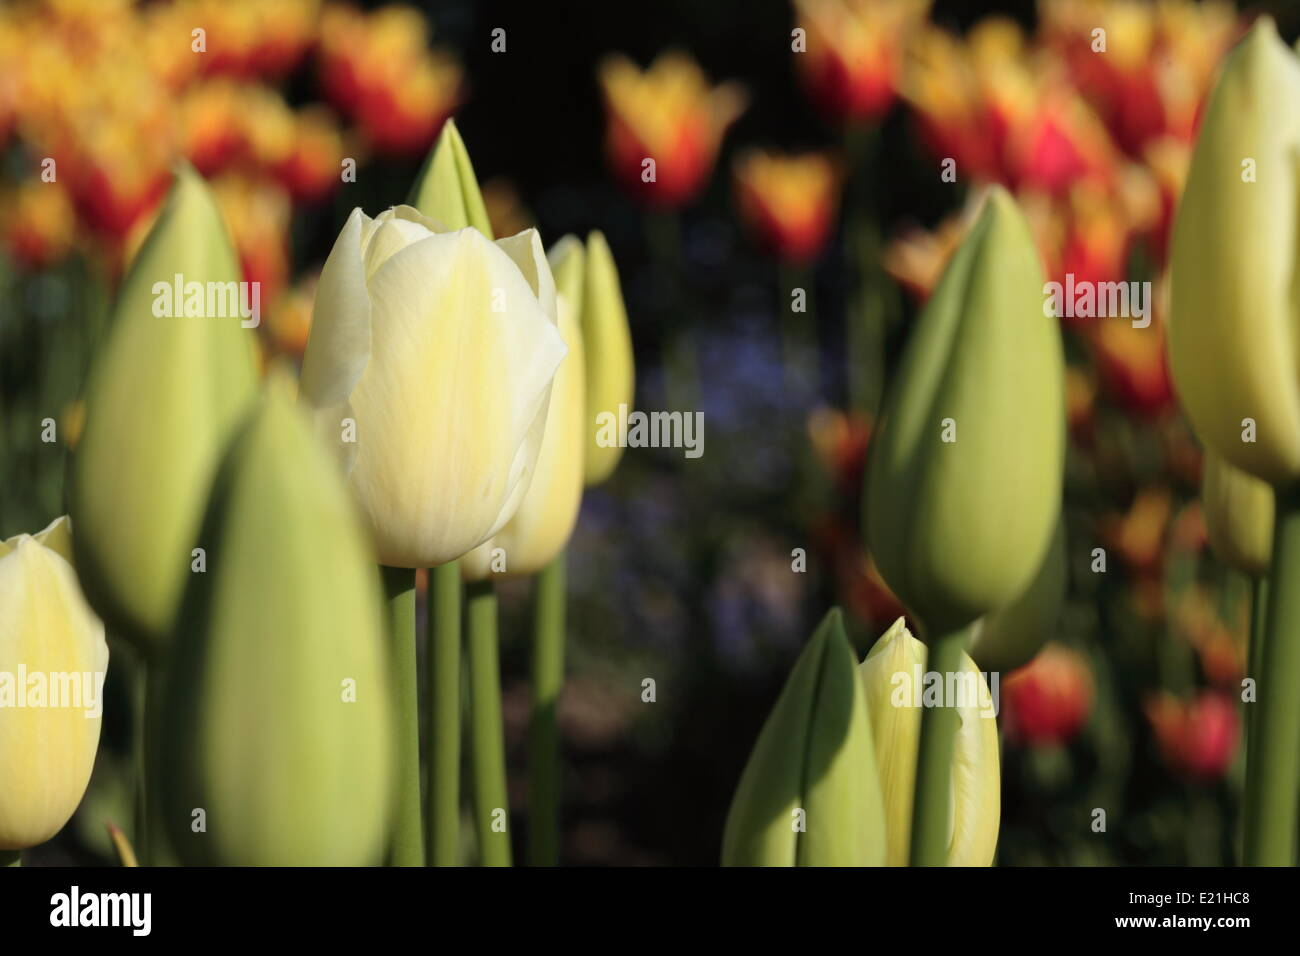 Triumph-Tulip 'Happy Generation' Photo Stock